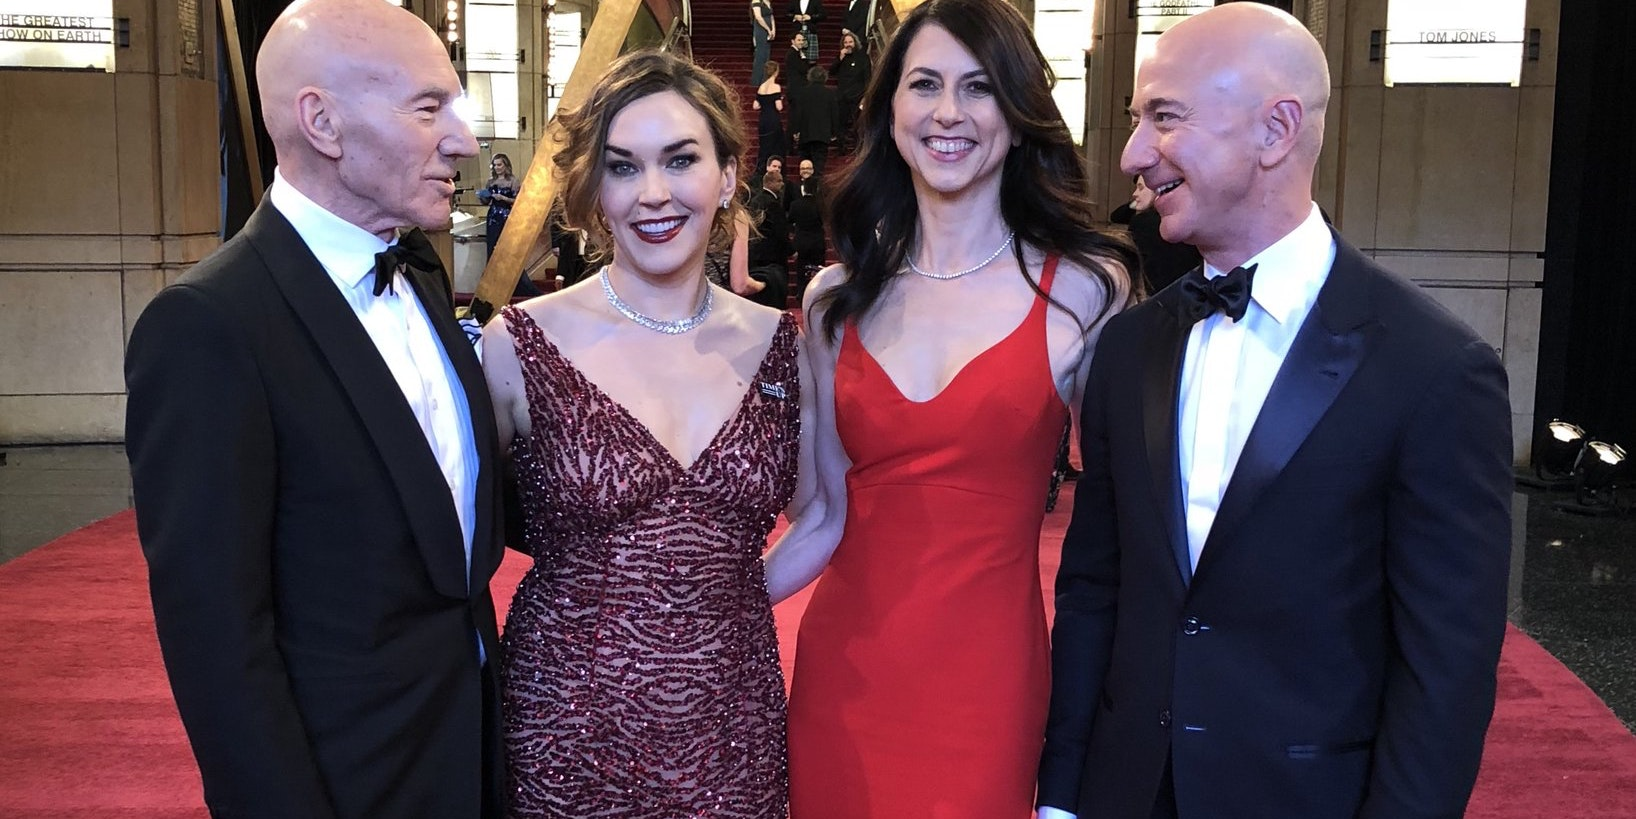 Jeff Bezos Reveals His Personal Style Icon Captain Picard Inverse